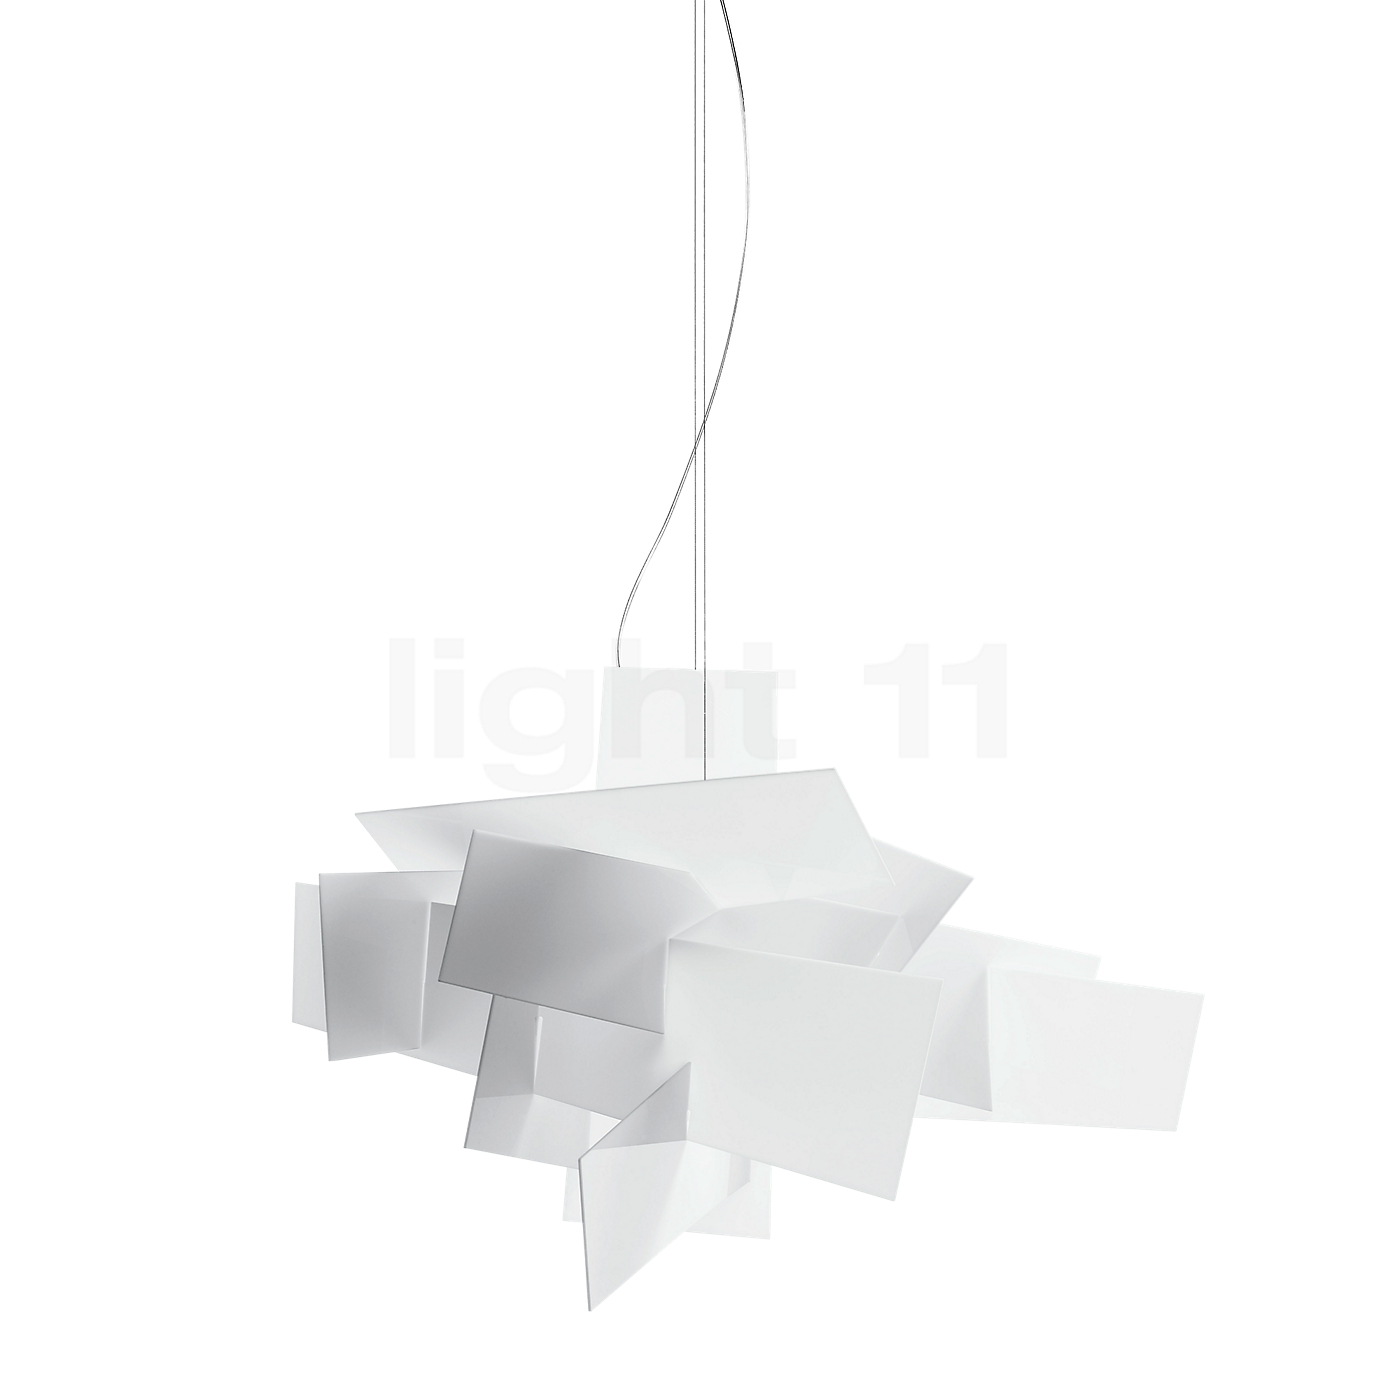 foscarini big bang l sospensione led k be p. Black Bedroom Furniture Sets. Home Design Ideas